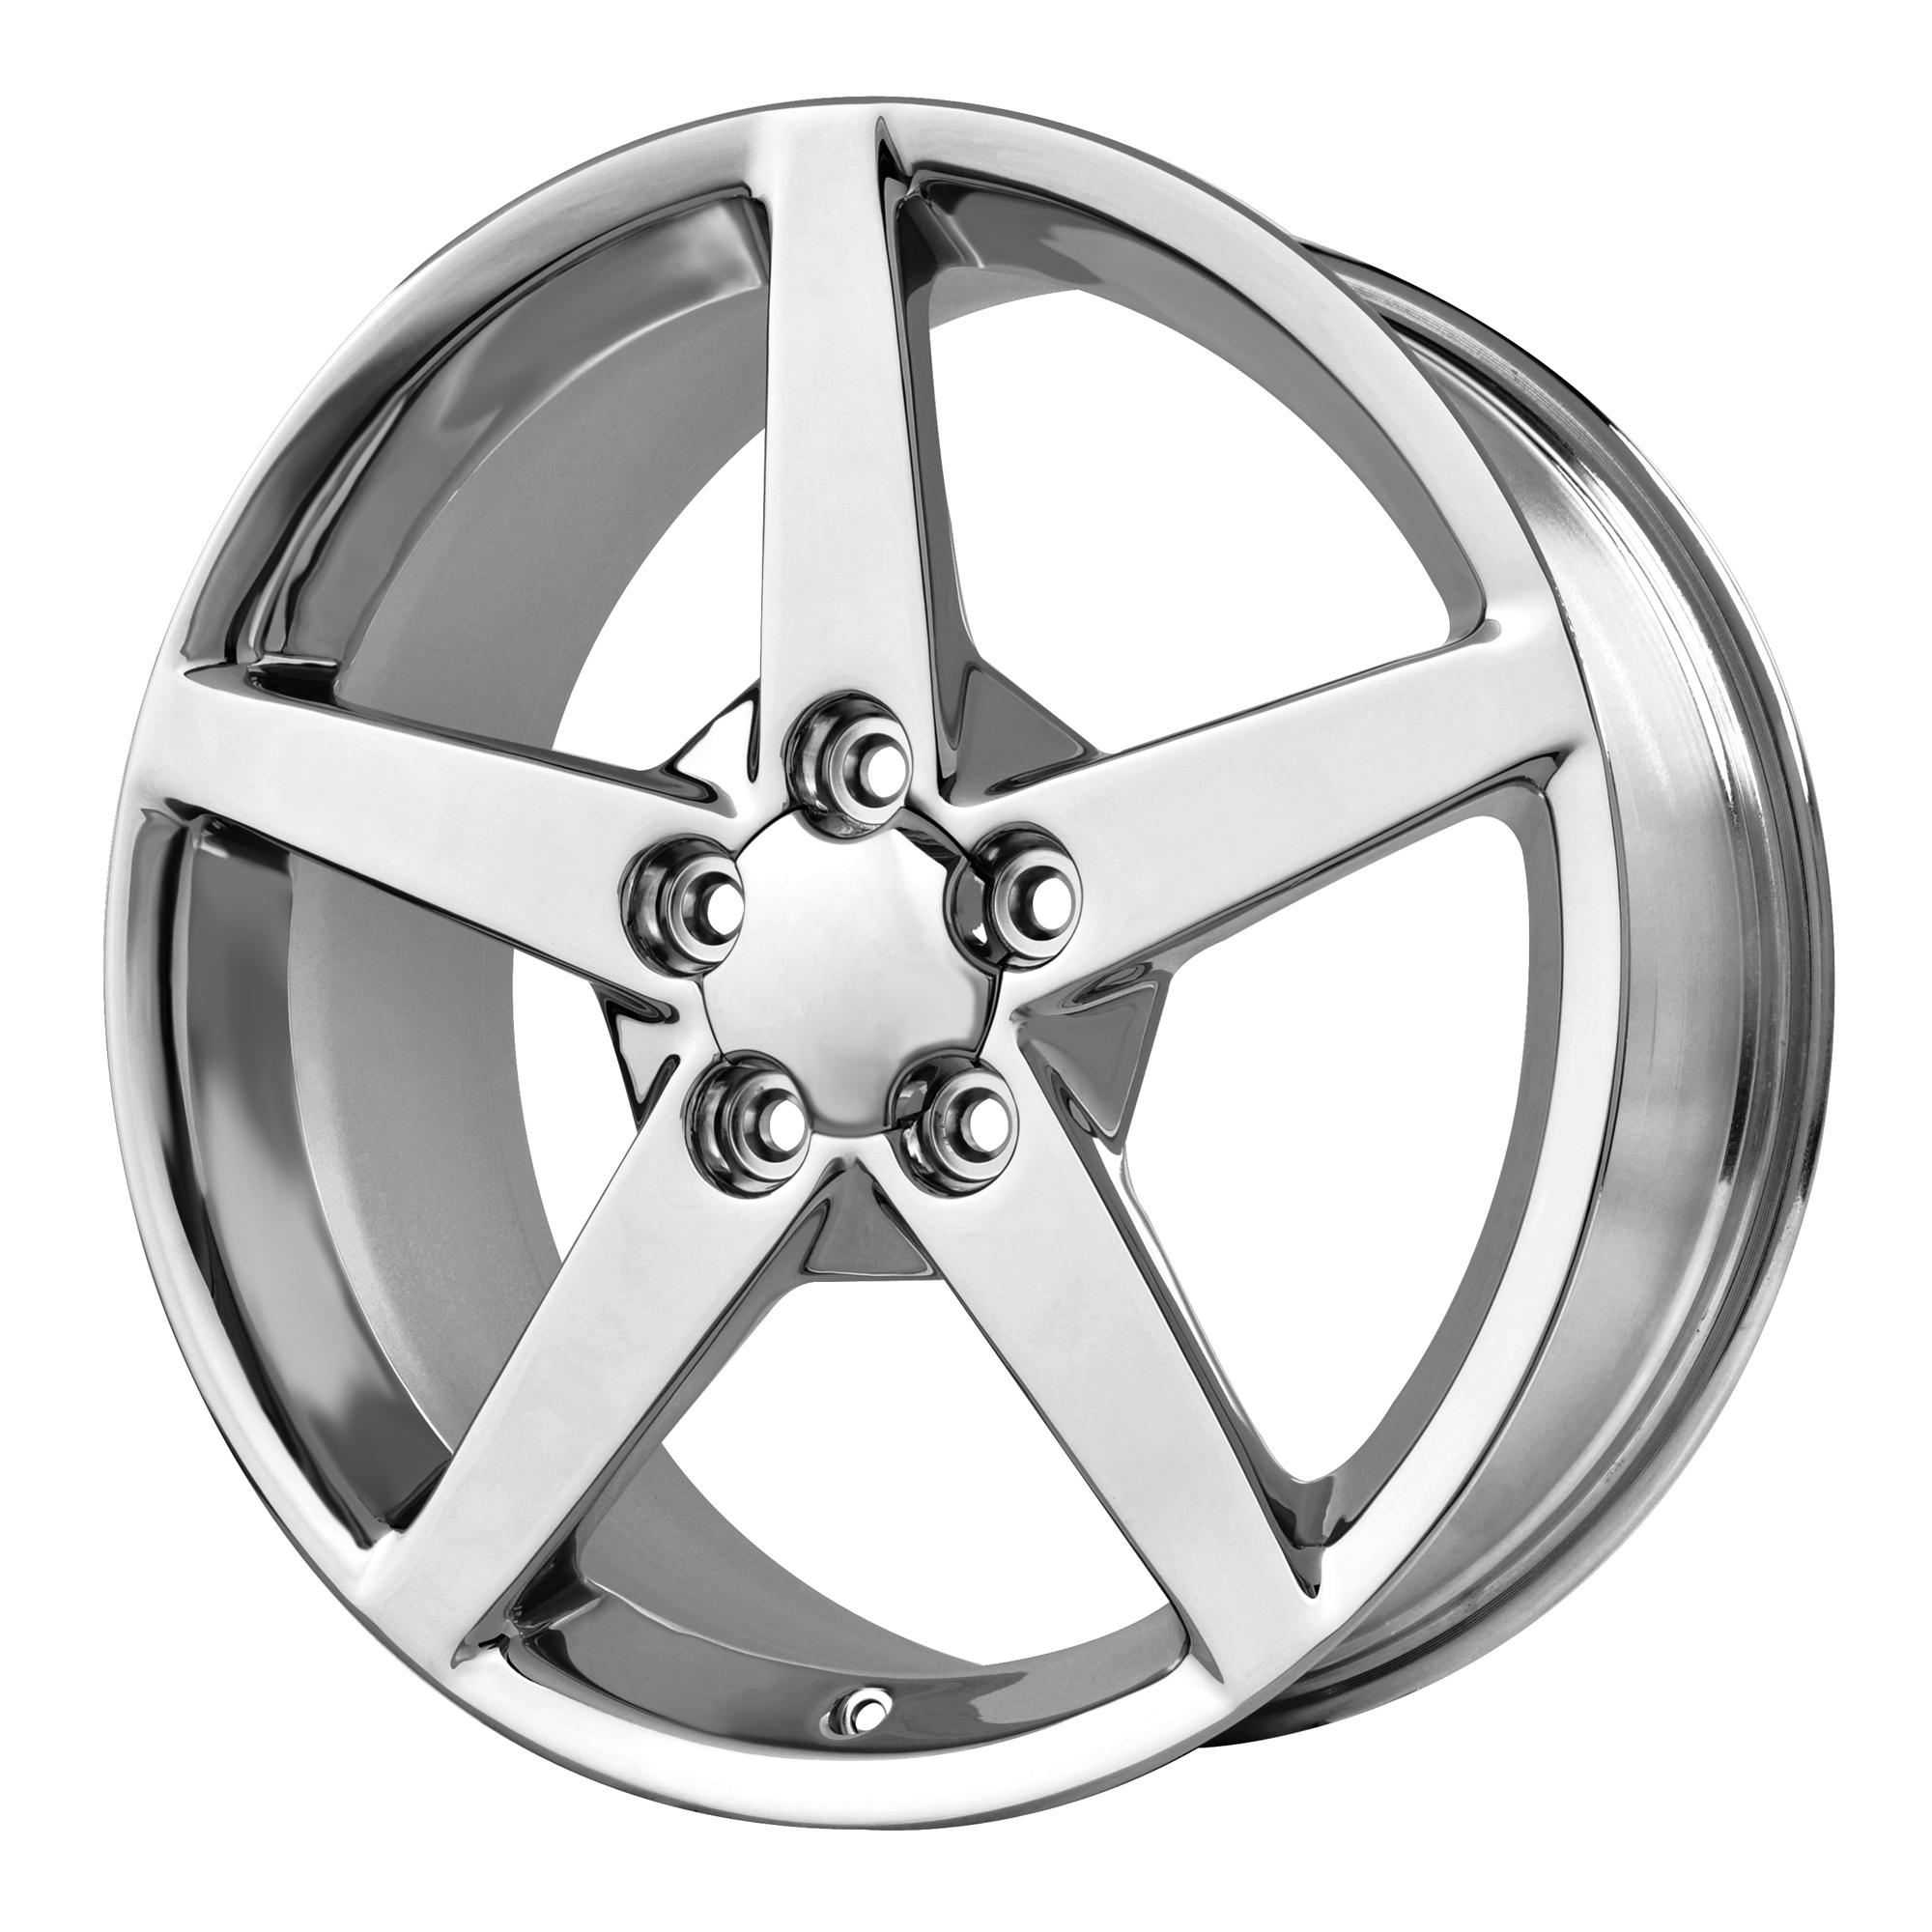 OE Creations Replica Wheels OE Creations 114C Chrome